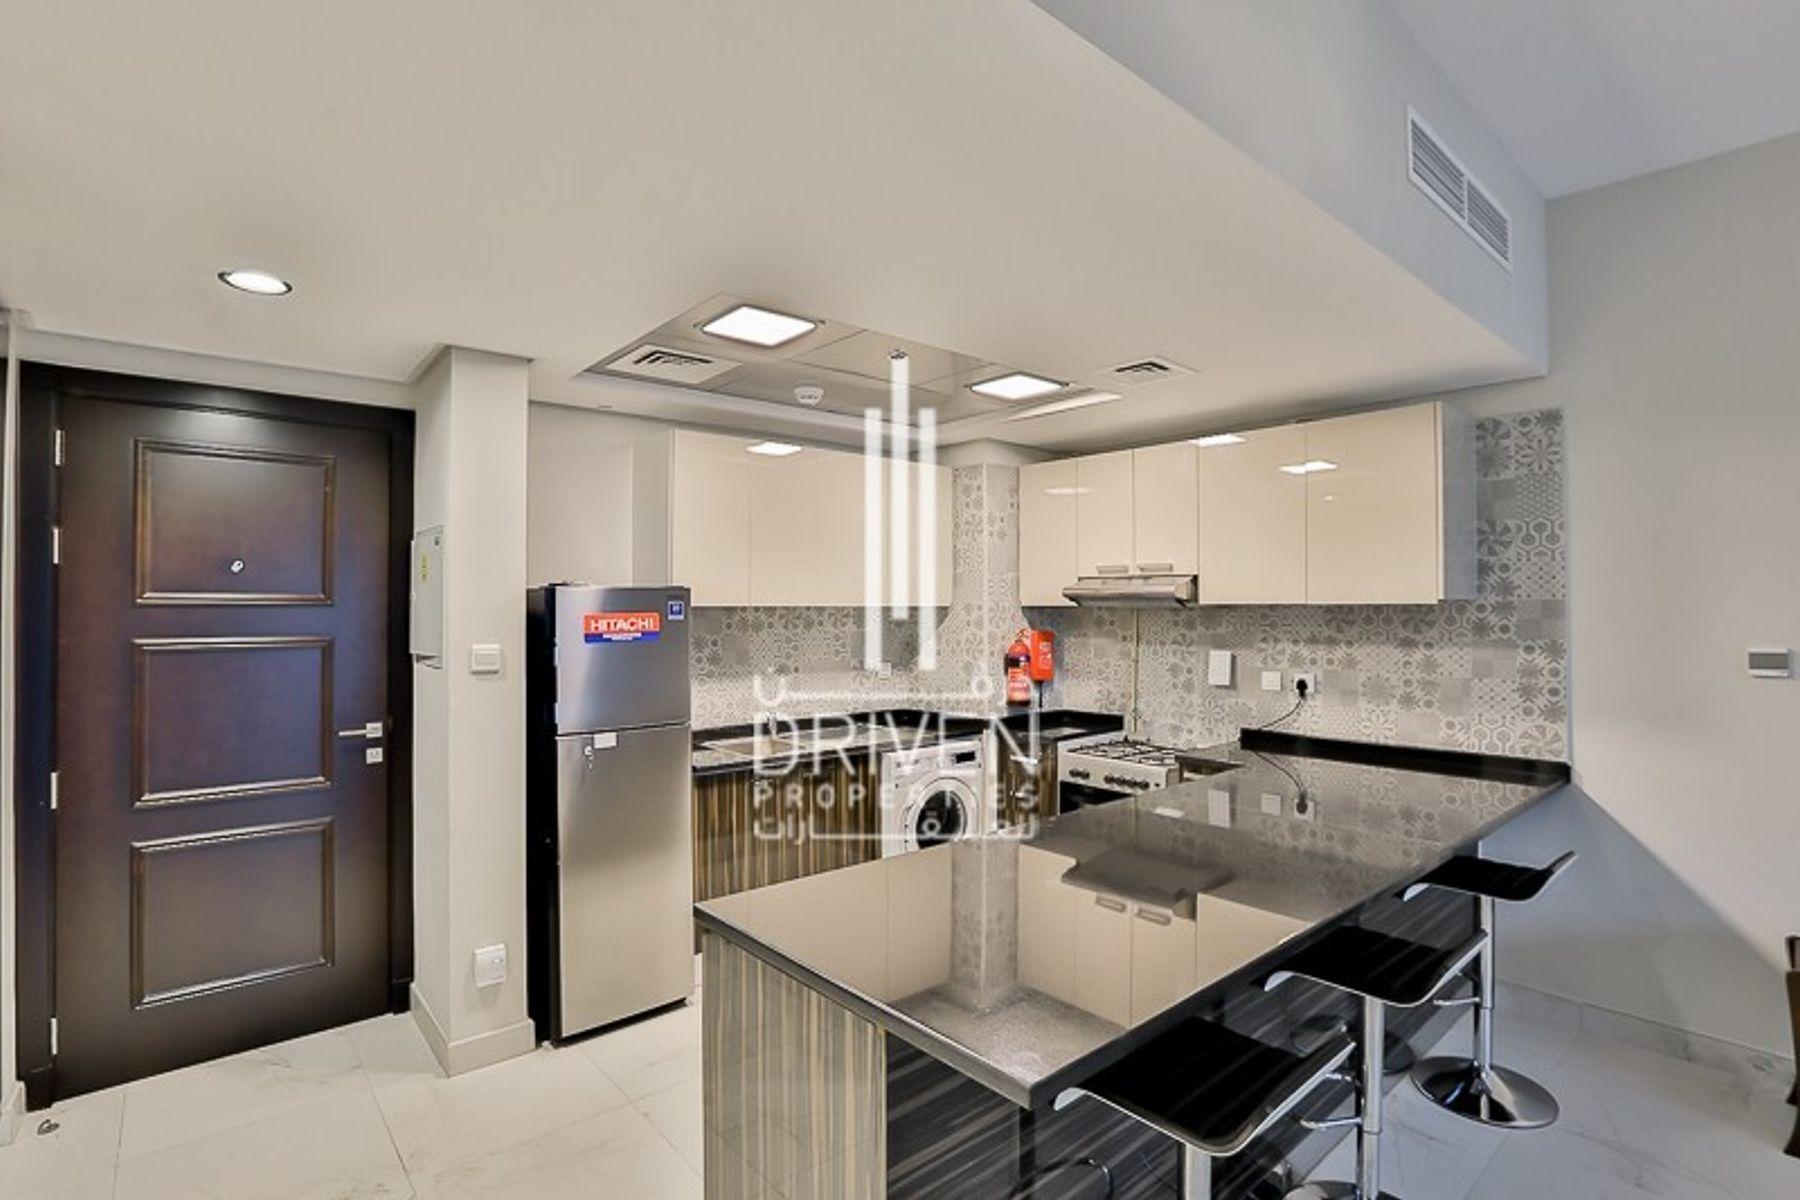 Apartment for Rent in MAG 525 - Dubai South (Dubai World Central)